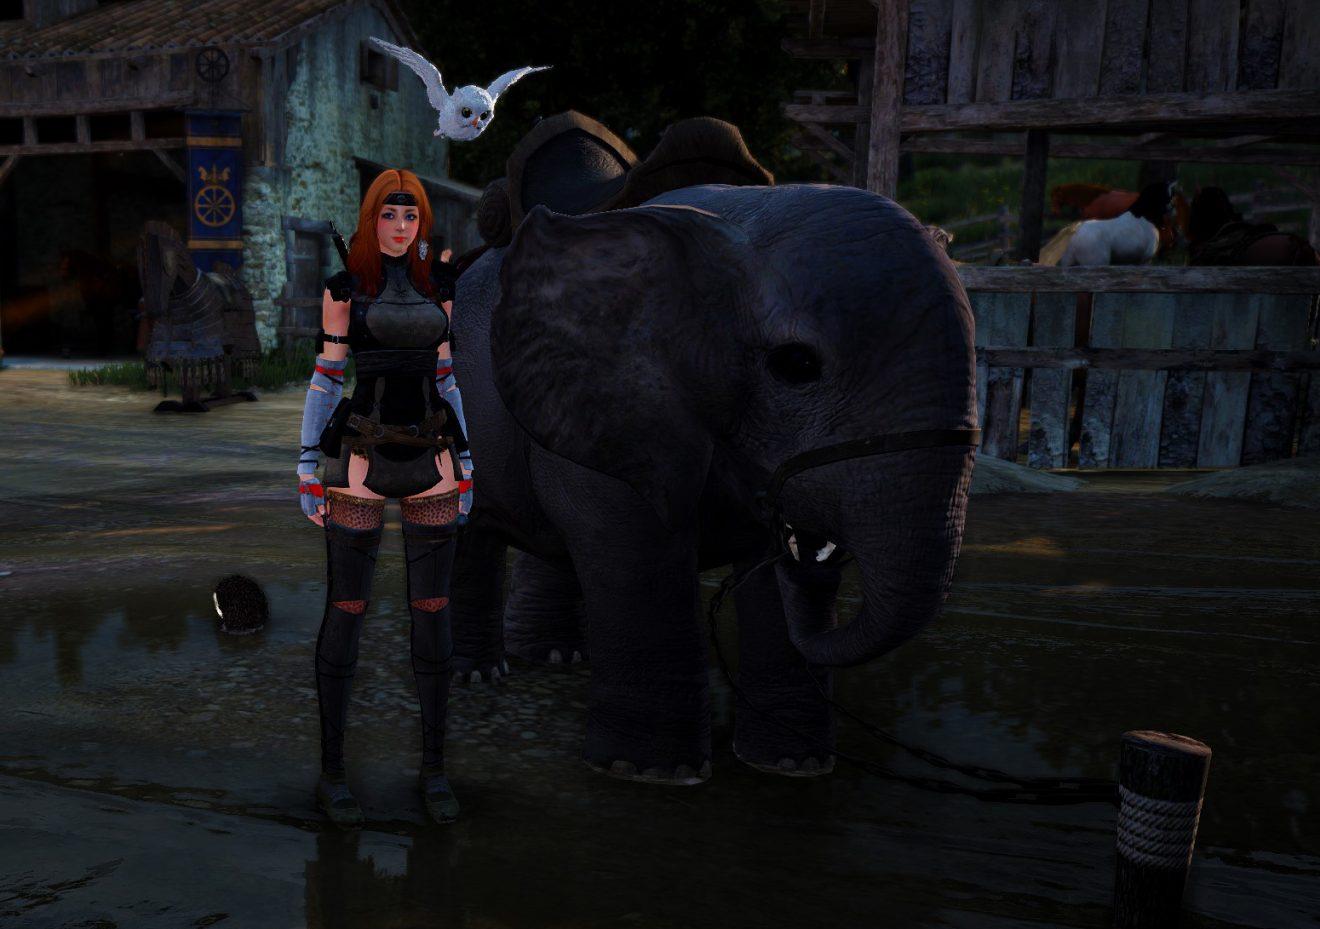 Getting a Miniature Elephant - Rebellicious